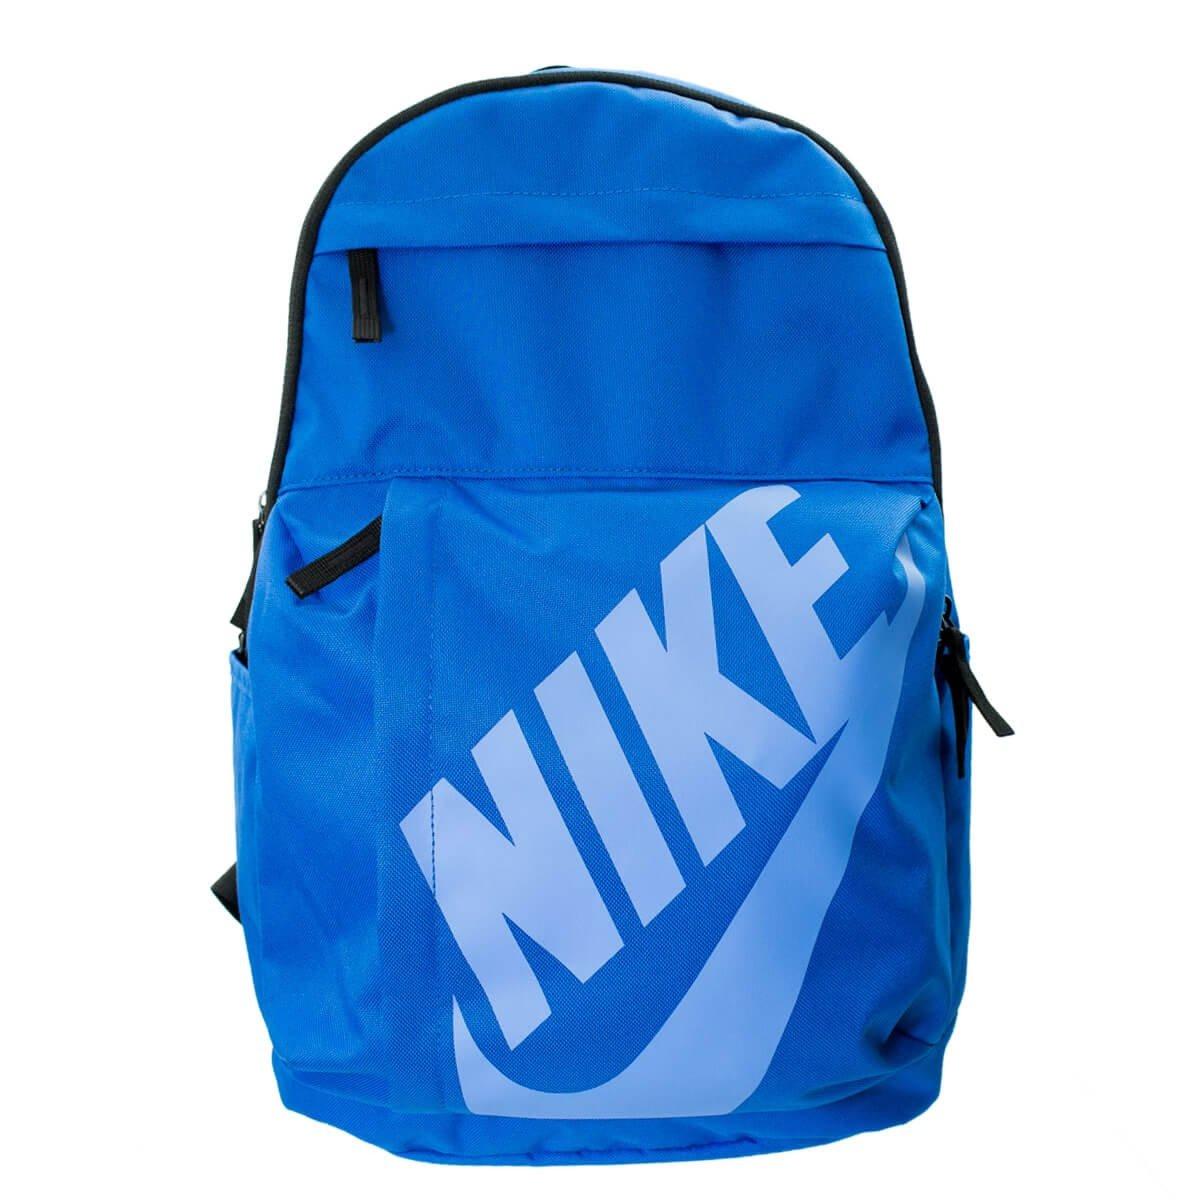 e319c349d7 mochila nike element backpack ba5381-445 azul. Carregando zoom.